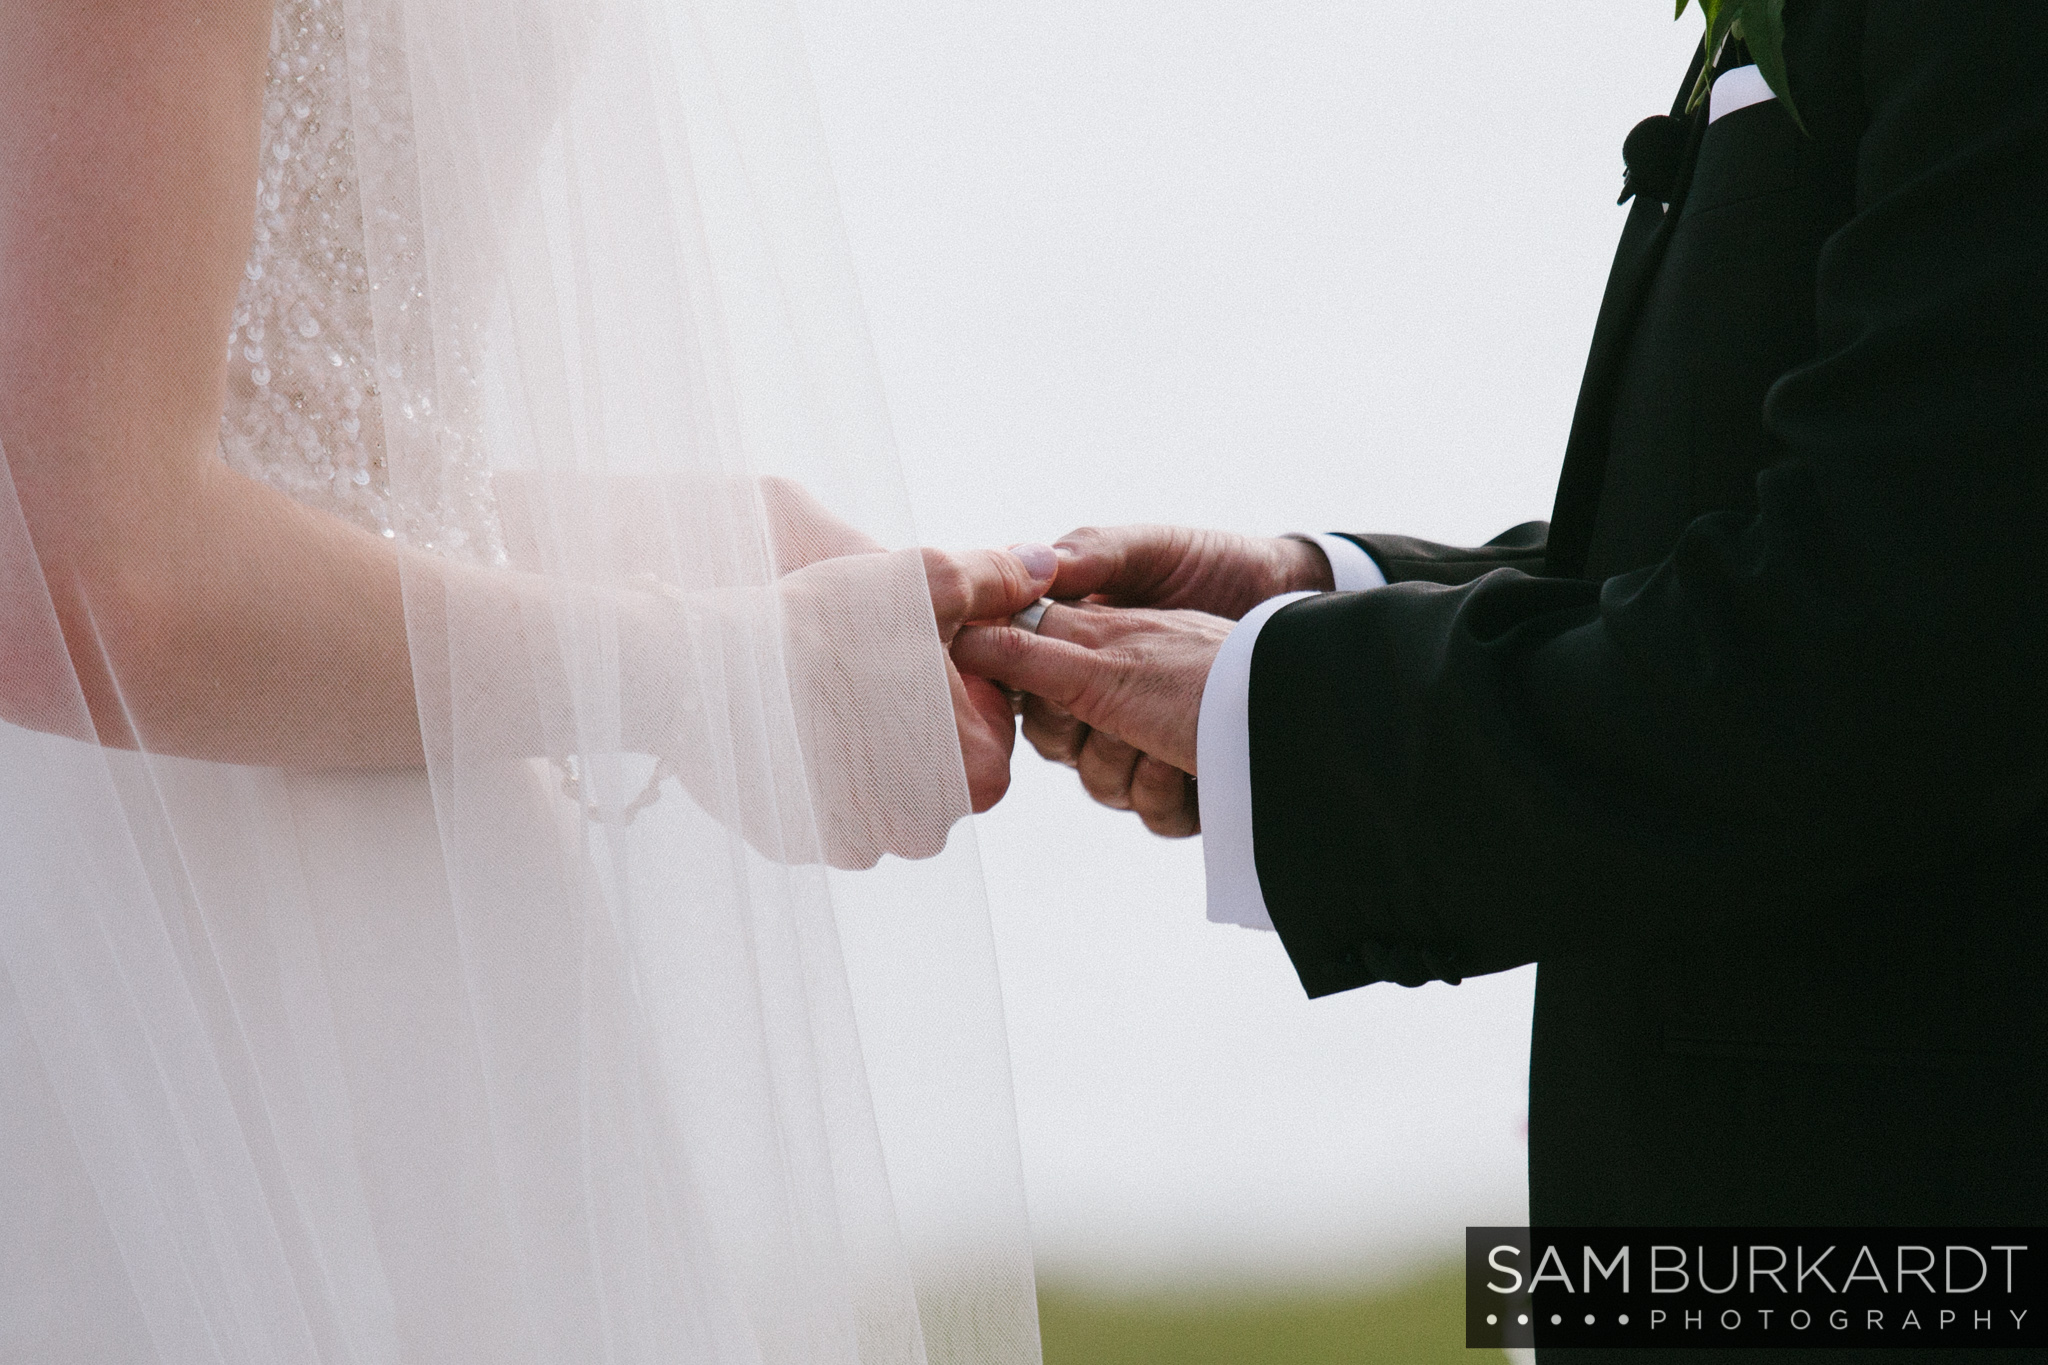 samburkardt_platz_moore_connecticut_branford_house_long_island_sound_august_photography_wedding_glamour_pink_0027.jpg